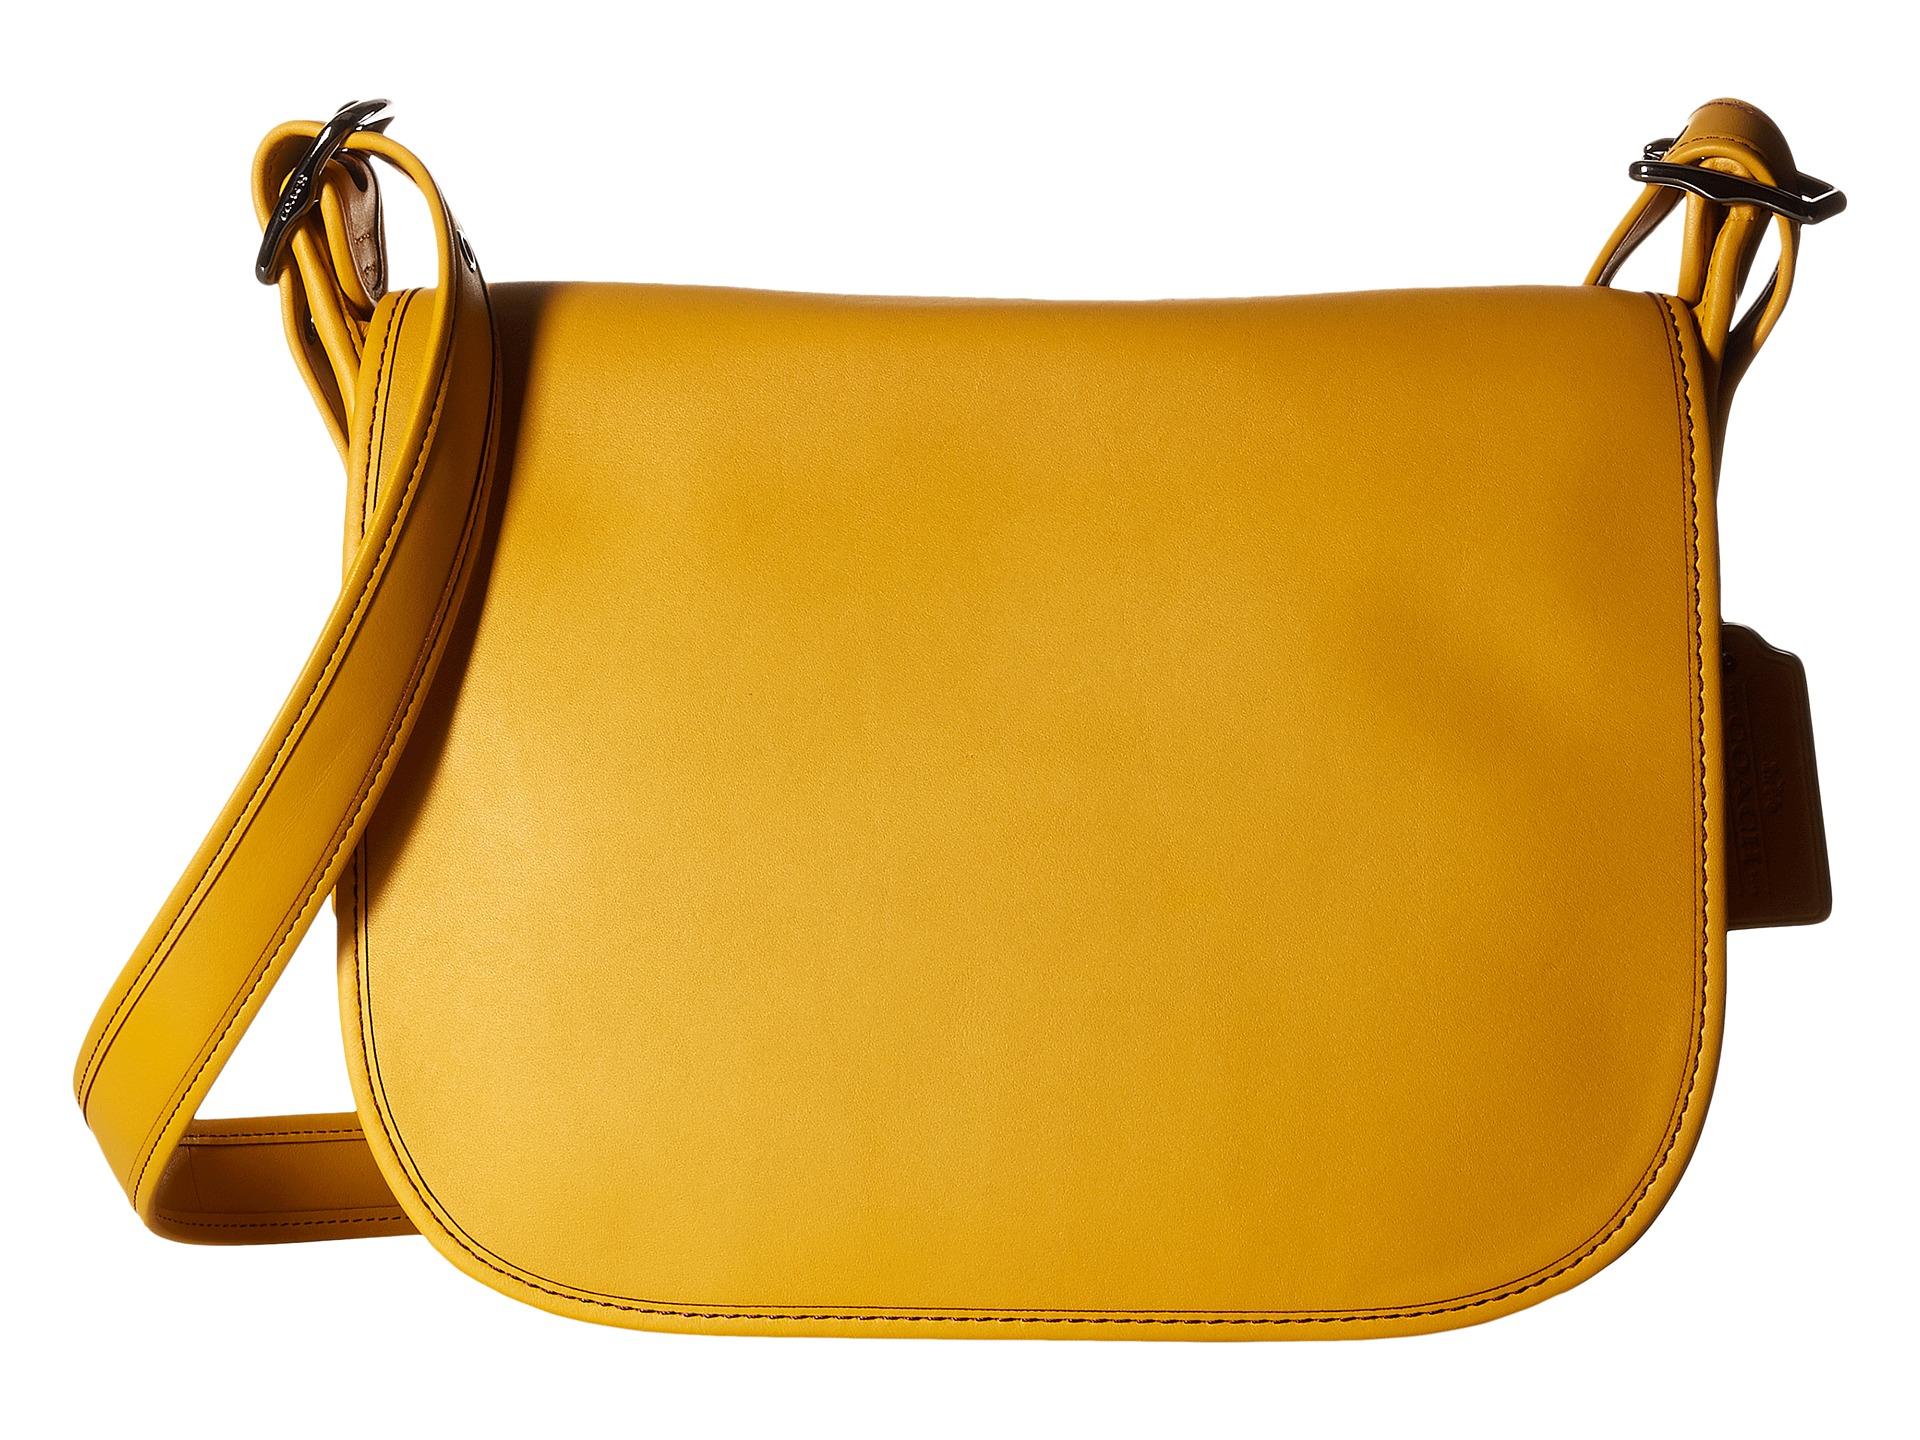 83970a6b5ac ... 23 In Glovetanned Leather - Disney Coach Gloveton Leather Saddle Bag  Lyst ...